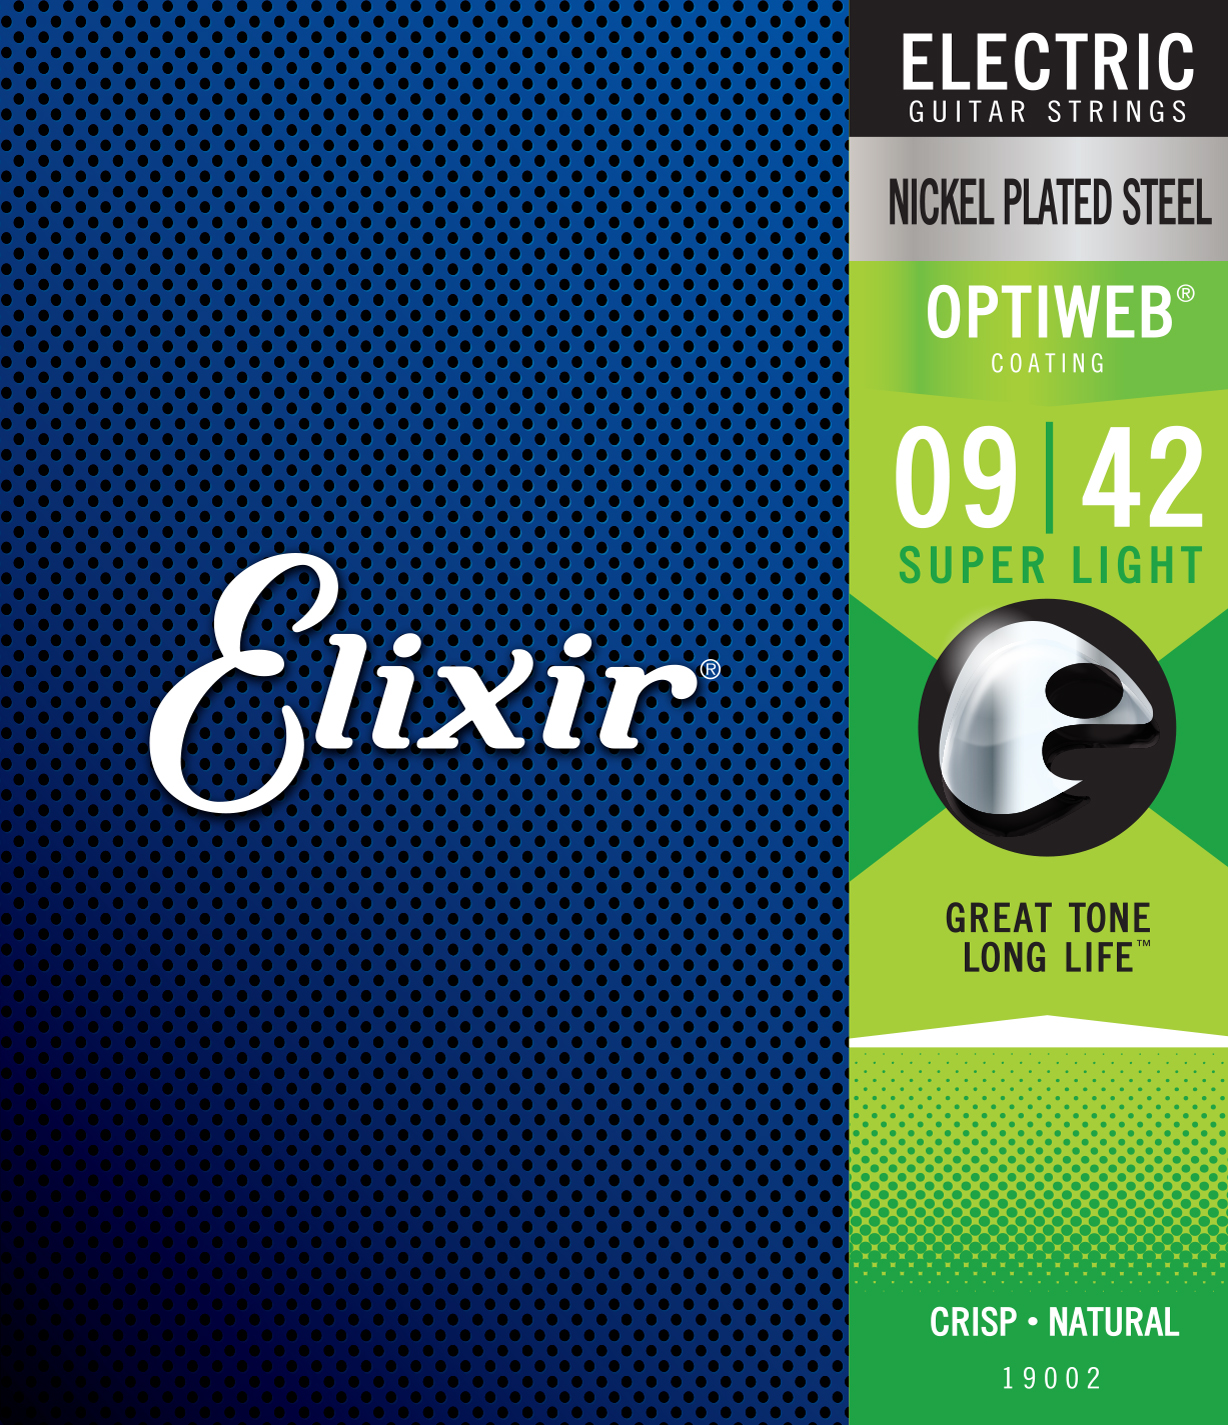 Elixir String Electric Nickel Plated Steel Strings With OPTIWEB Coating, ALL Model